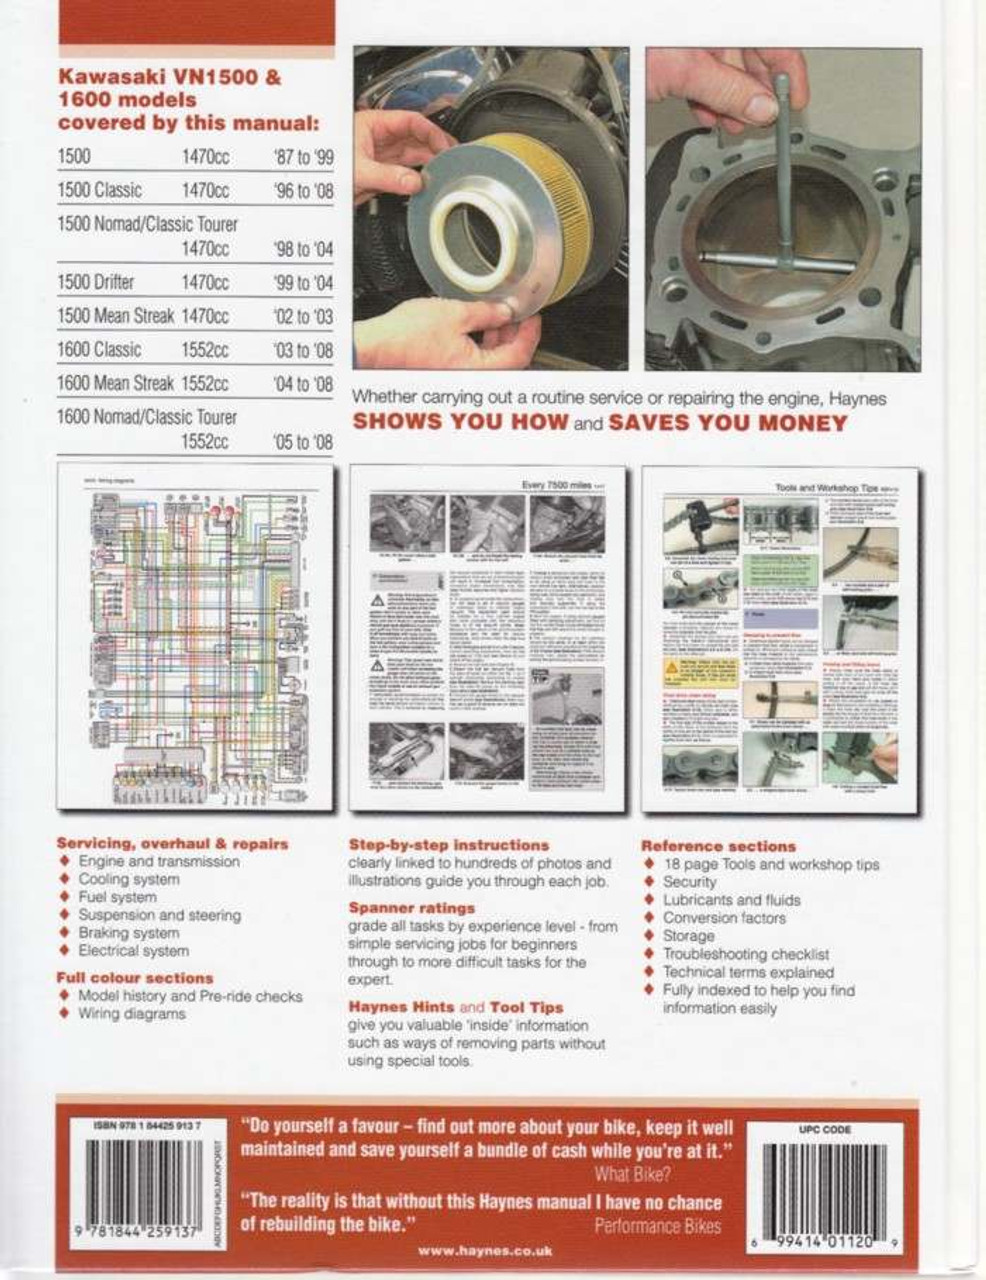 kawasaki vulcan 1500 & 1600 1987 - 2008 workshop manual repair manual